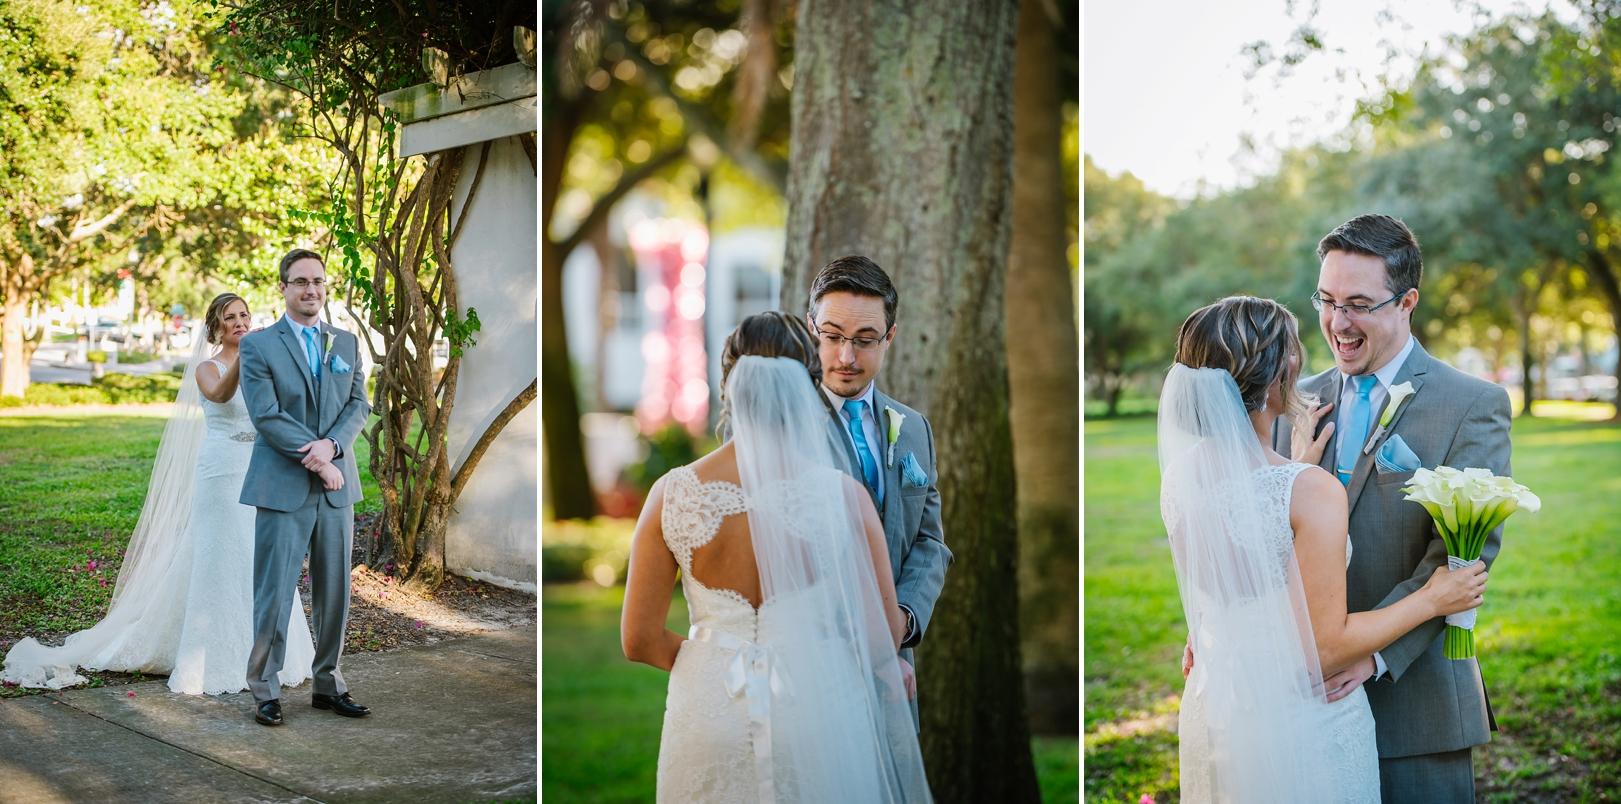 st-pete-art-museum-wedding-vinoy-ashlee-hamon-photography_0006.jpg